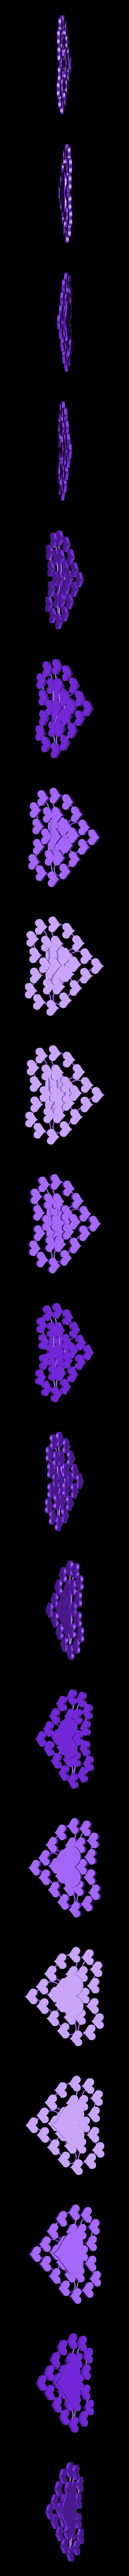 hearts.STL Download free STL file Love heart mobile phone stand. • 3D print model, technicsorganman